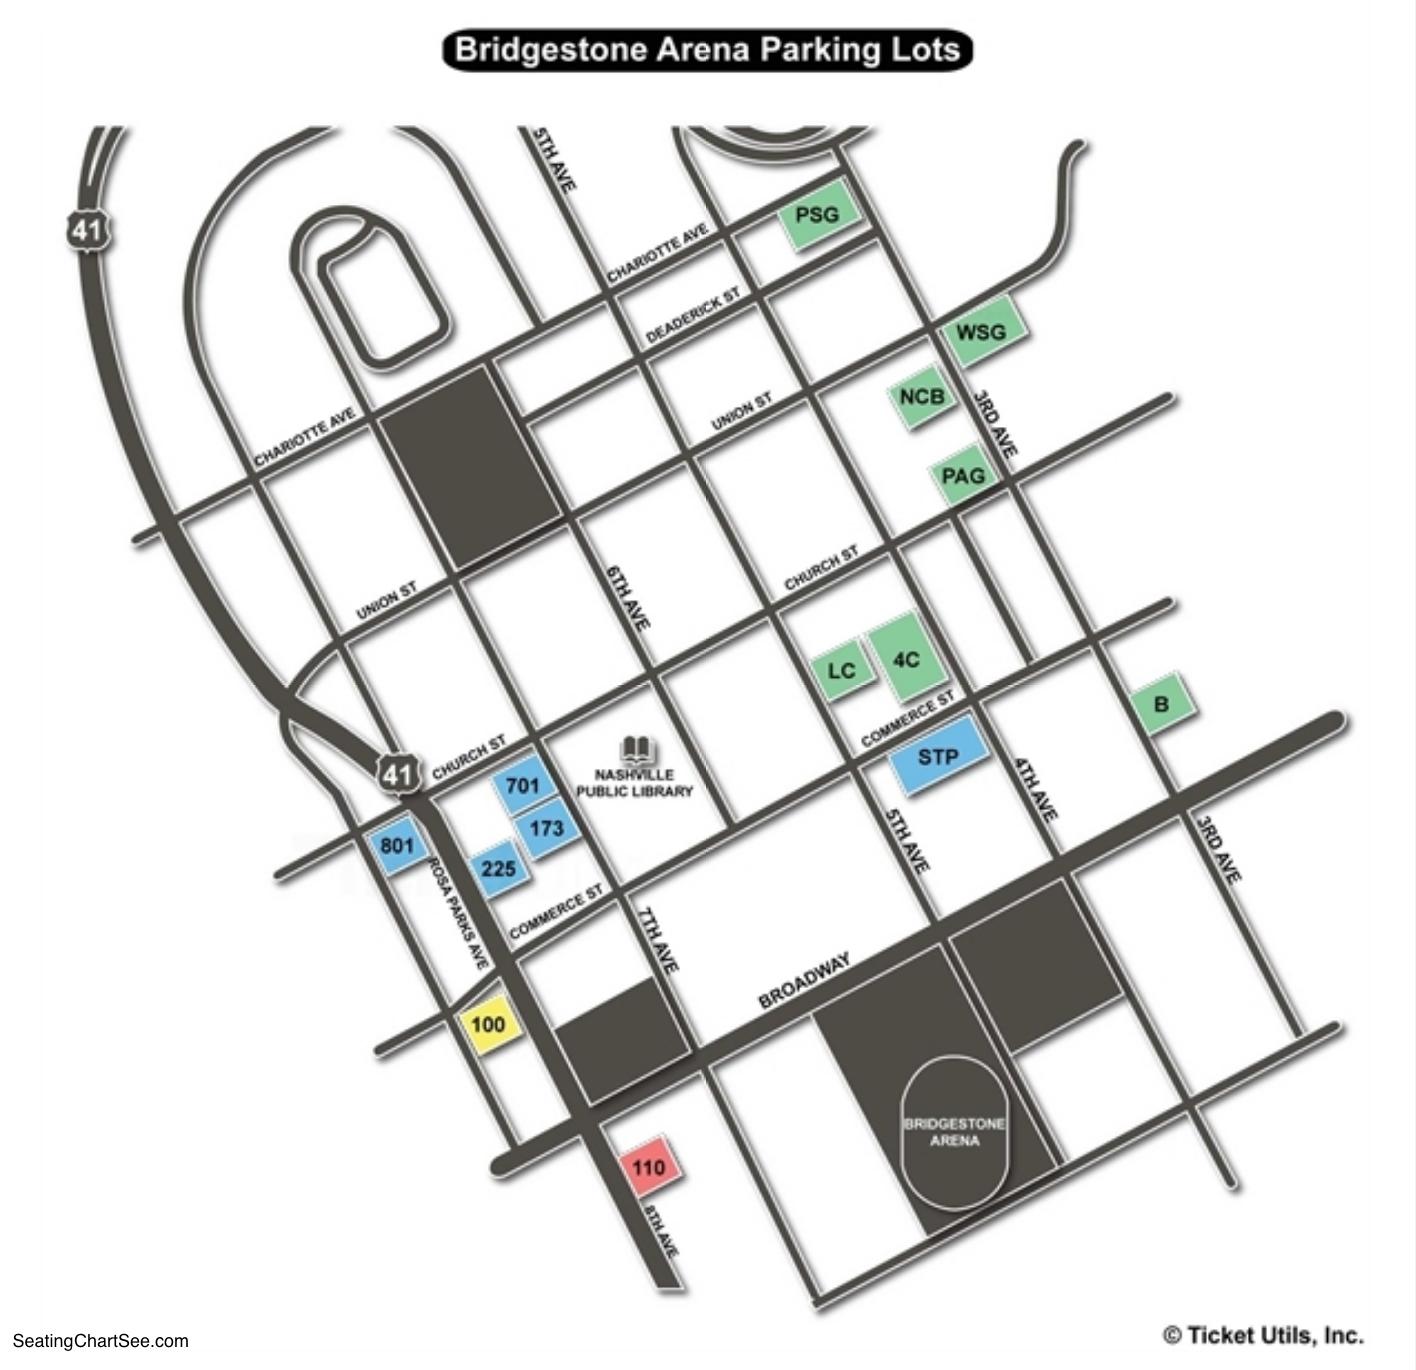 Bridgestone Arena Parking Lots Chart